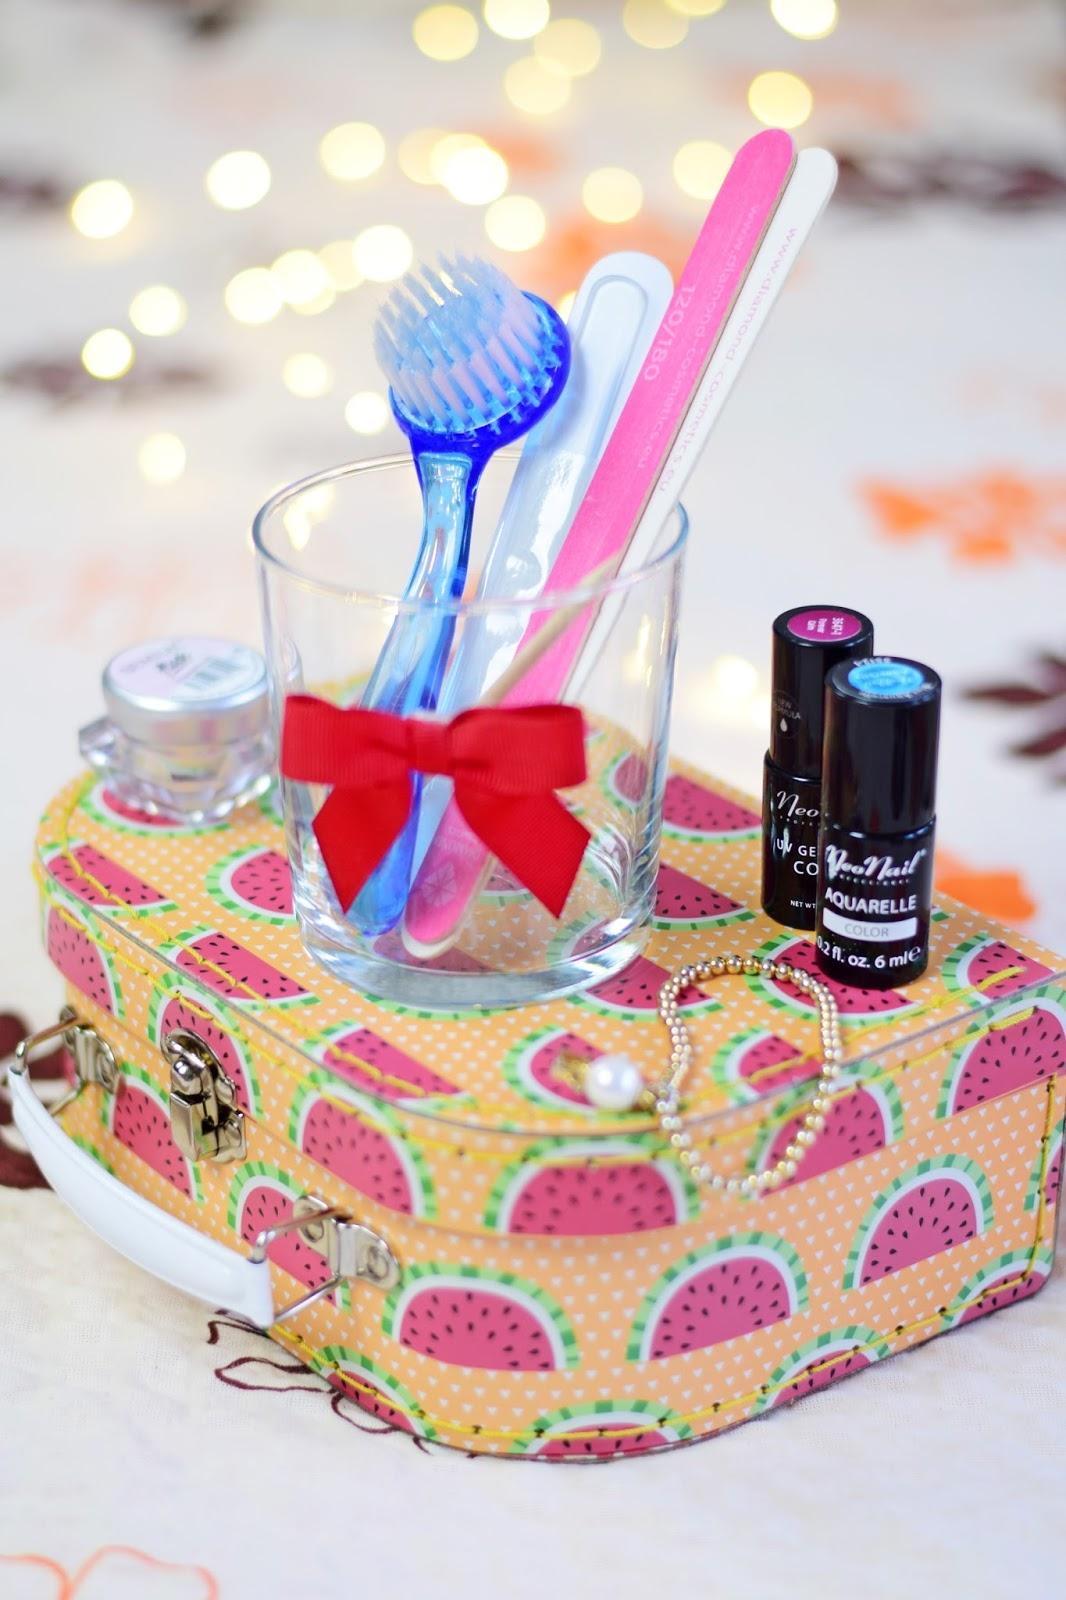 manicure_paznokcie_przydatne_gadżety_must_have_blog